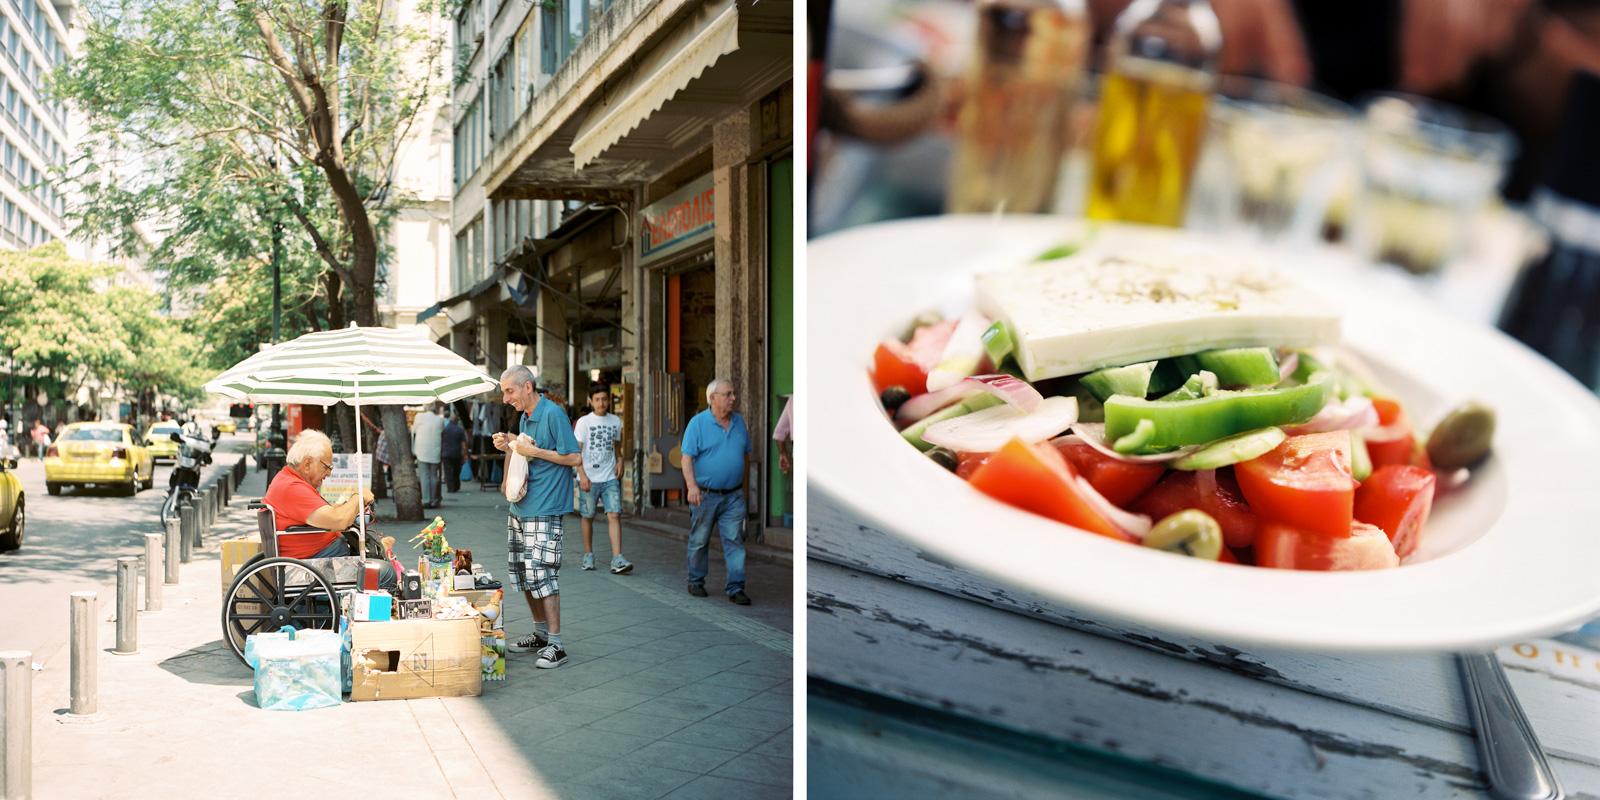 Athens_street-photography_Yashicamat124g_06.jpg